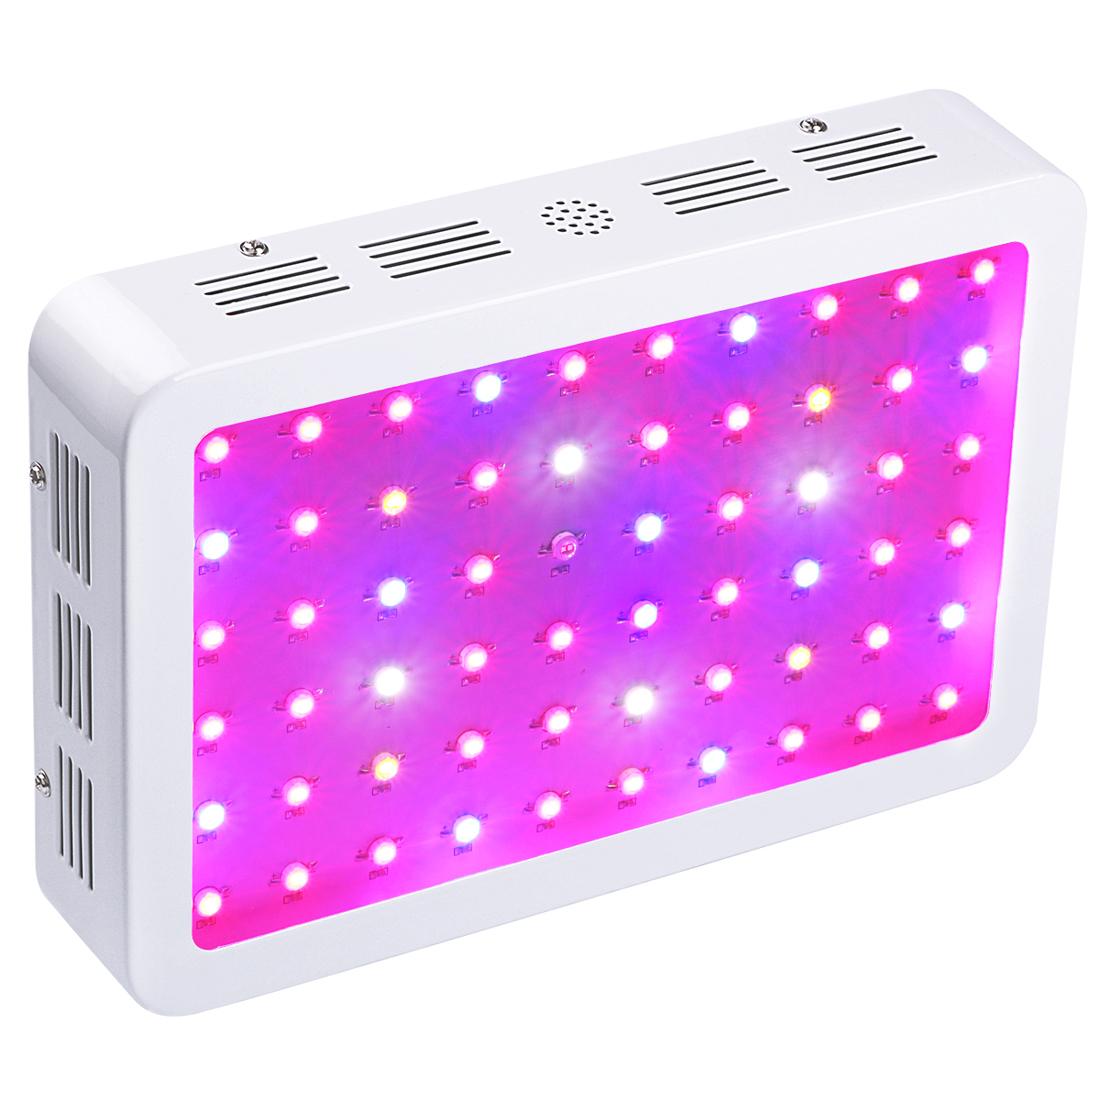 BOSSLED 600W LED Grow Light Full Spectrum Greenhouse Indoor Plant ...